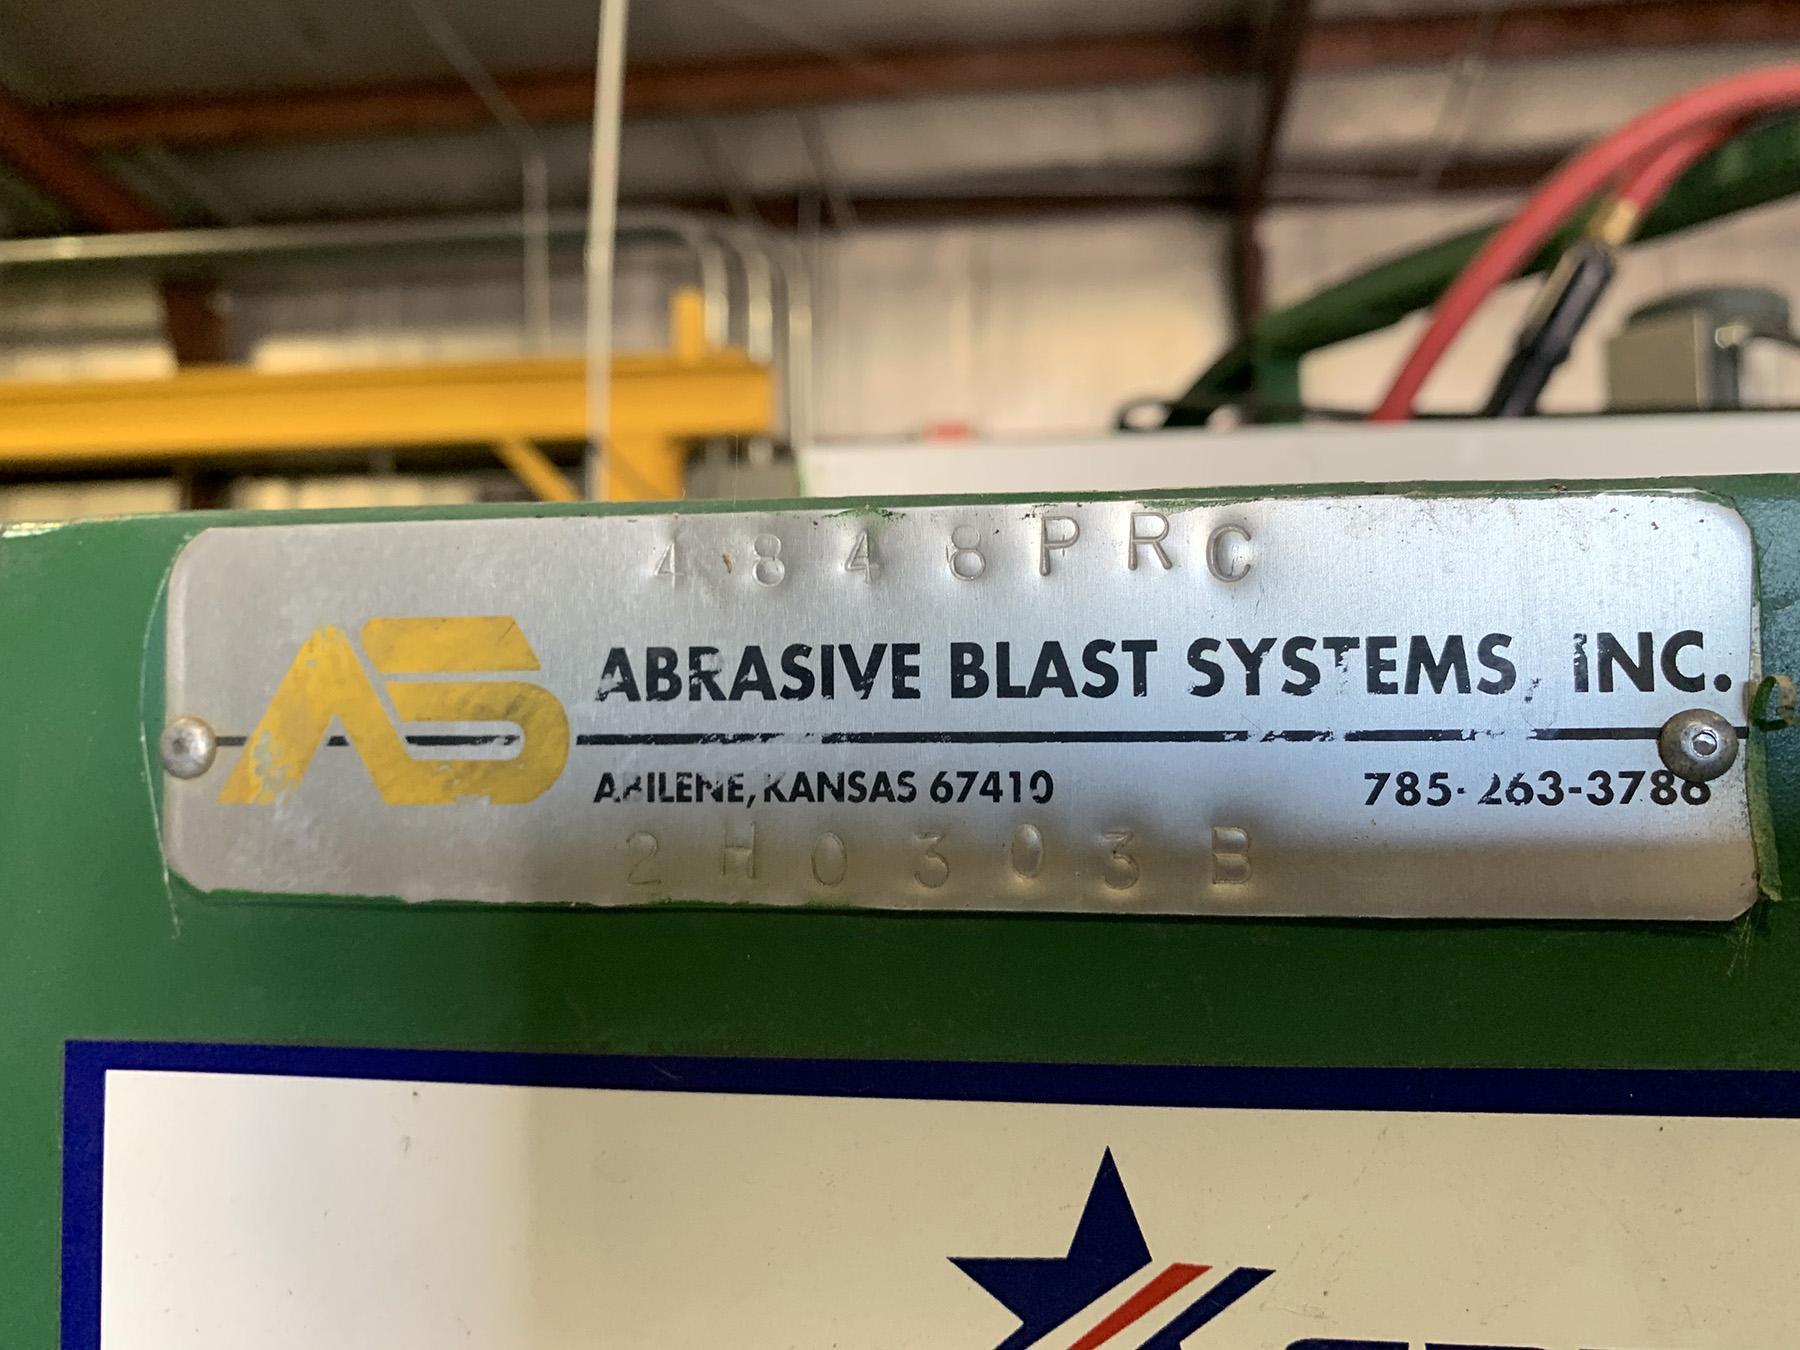 USED, ABRASIVE BLAST SYSTEMS INC. MODEL 4848PRC BLAST CABINET